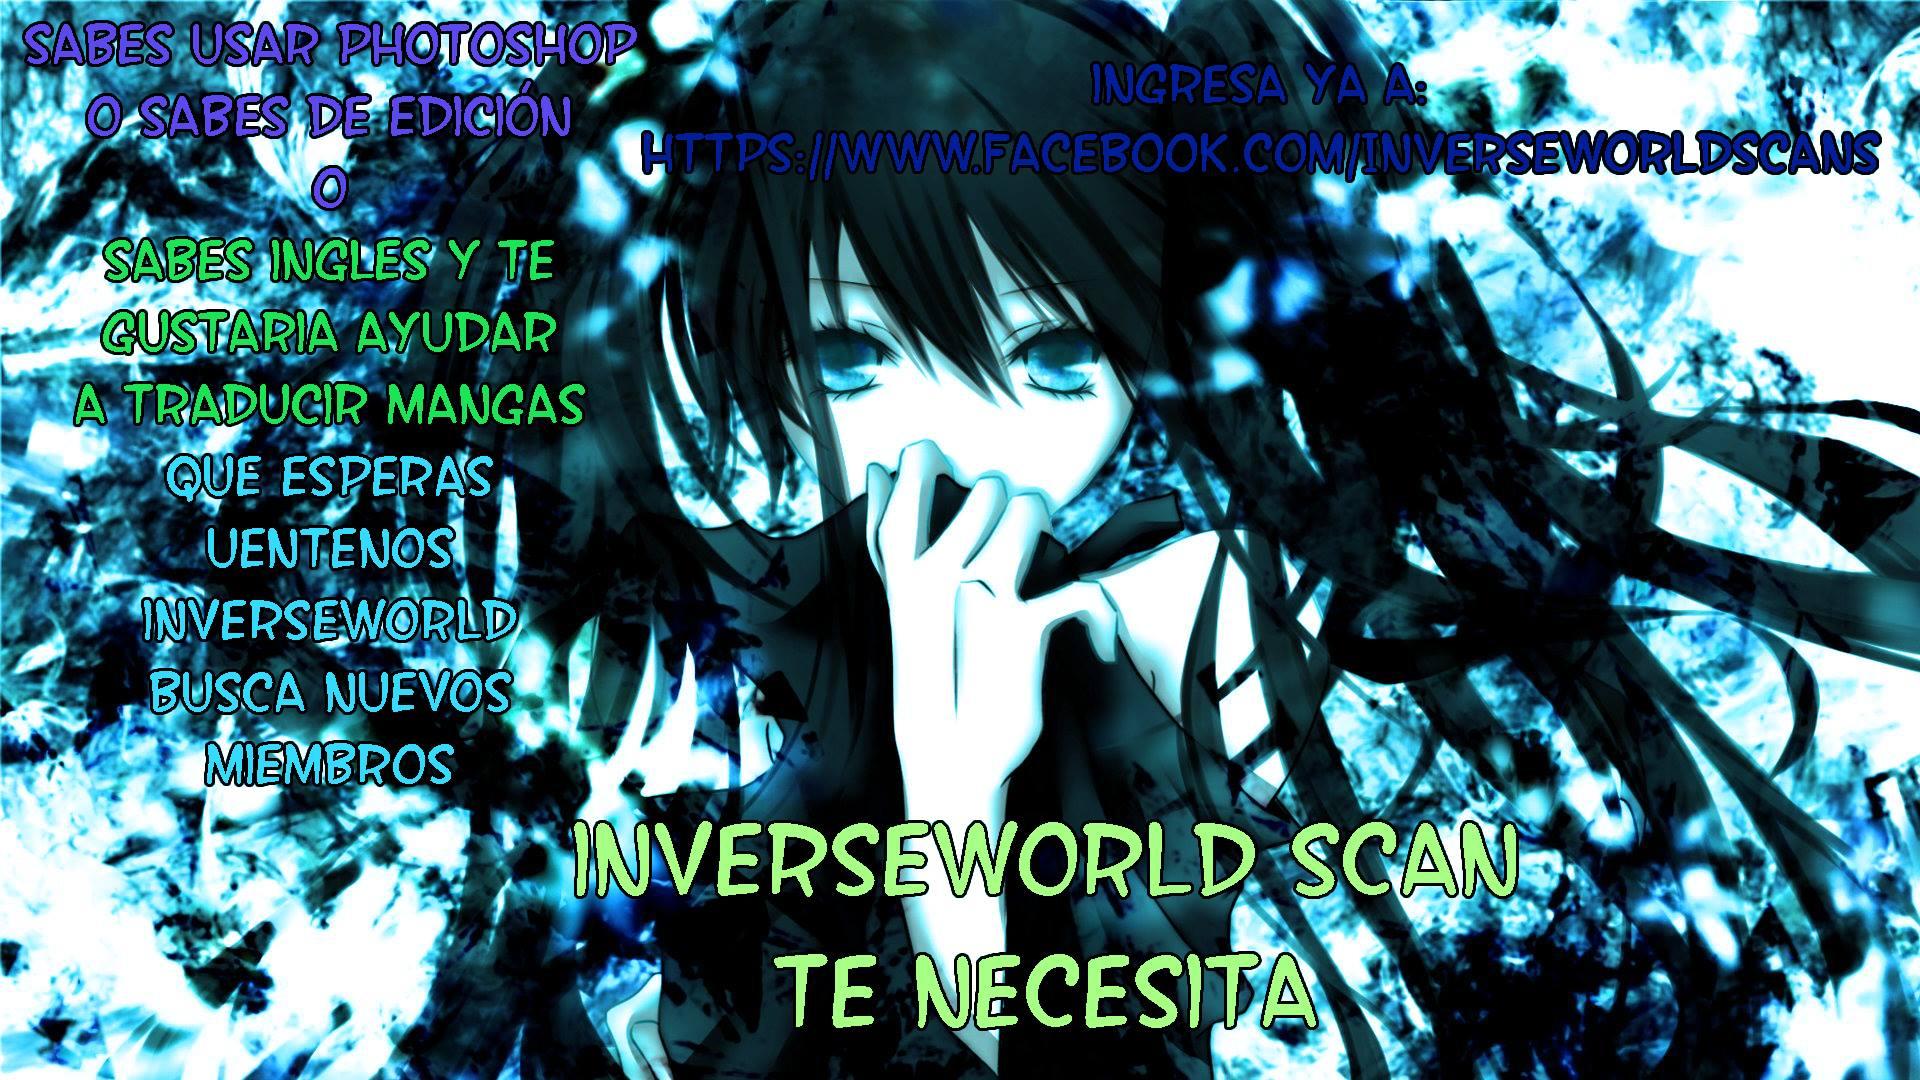 http://c5.ninemanga.com/es_manga/18/16210/415322/1d7944598827fac015ee561af34dd0b4.jpg Page 1